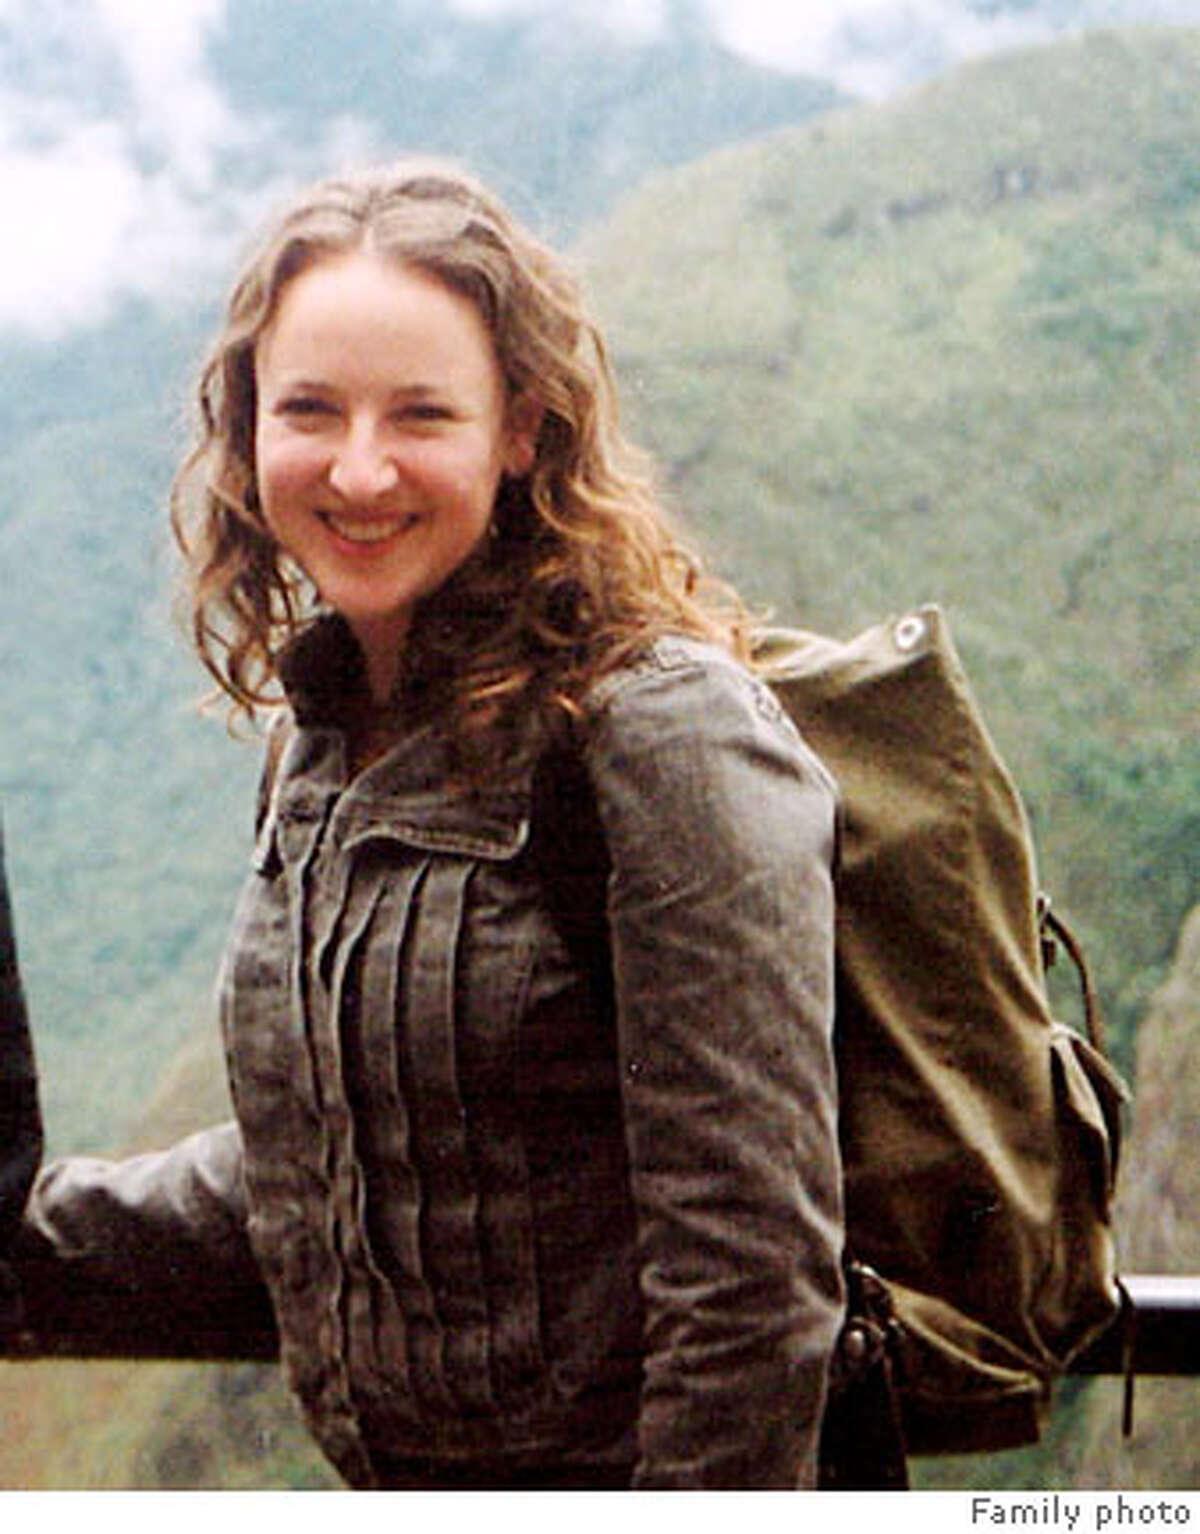 Graciela Sholl was killed on the way home from her waitressing job at Bar Crudo sushi restaurant. Family Photo